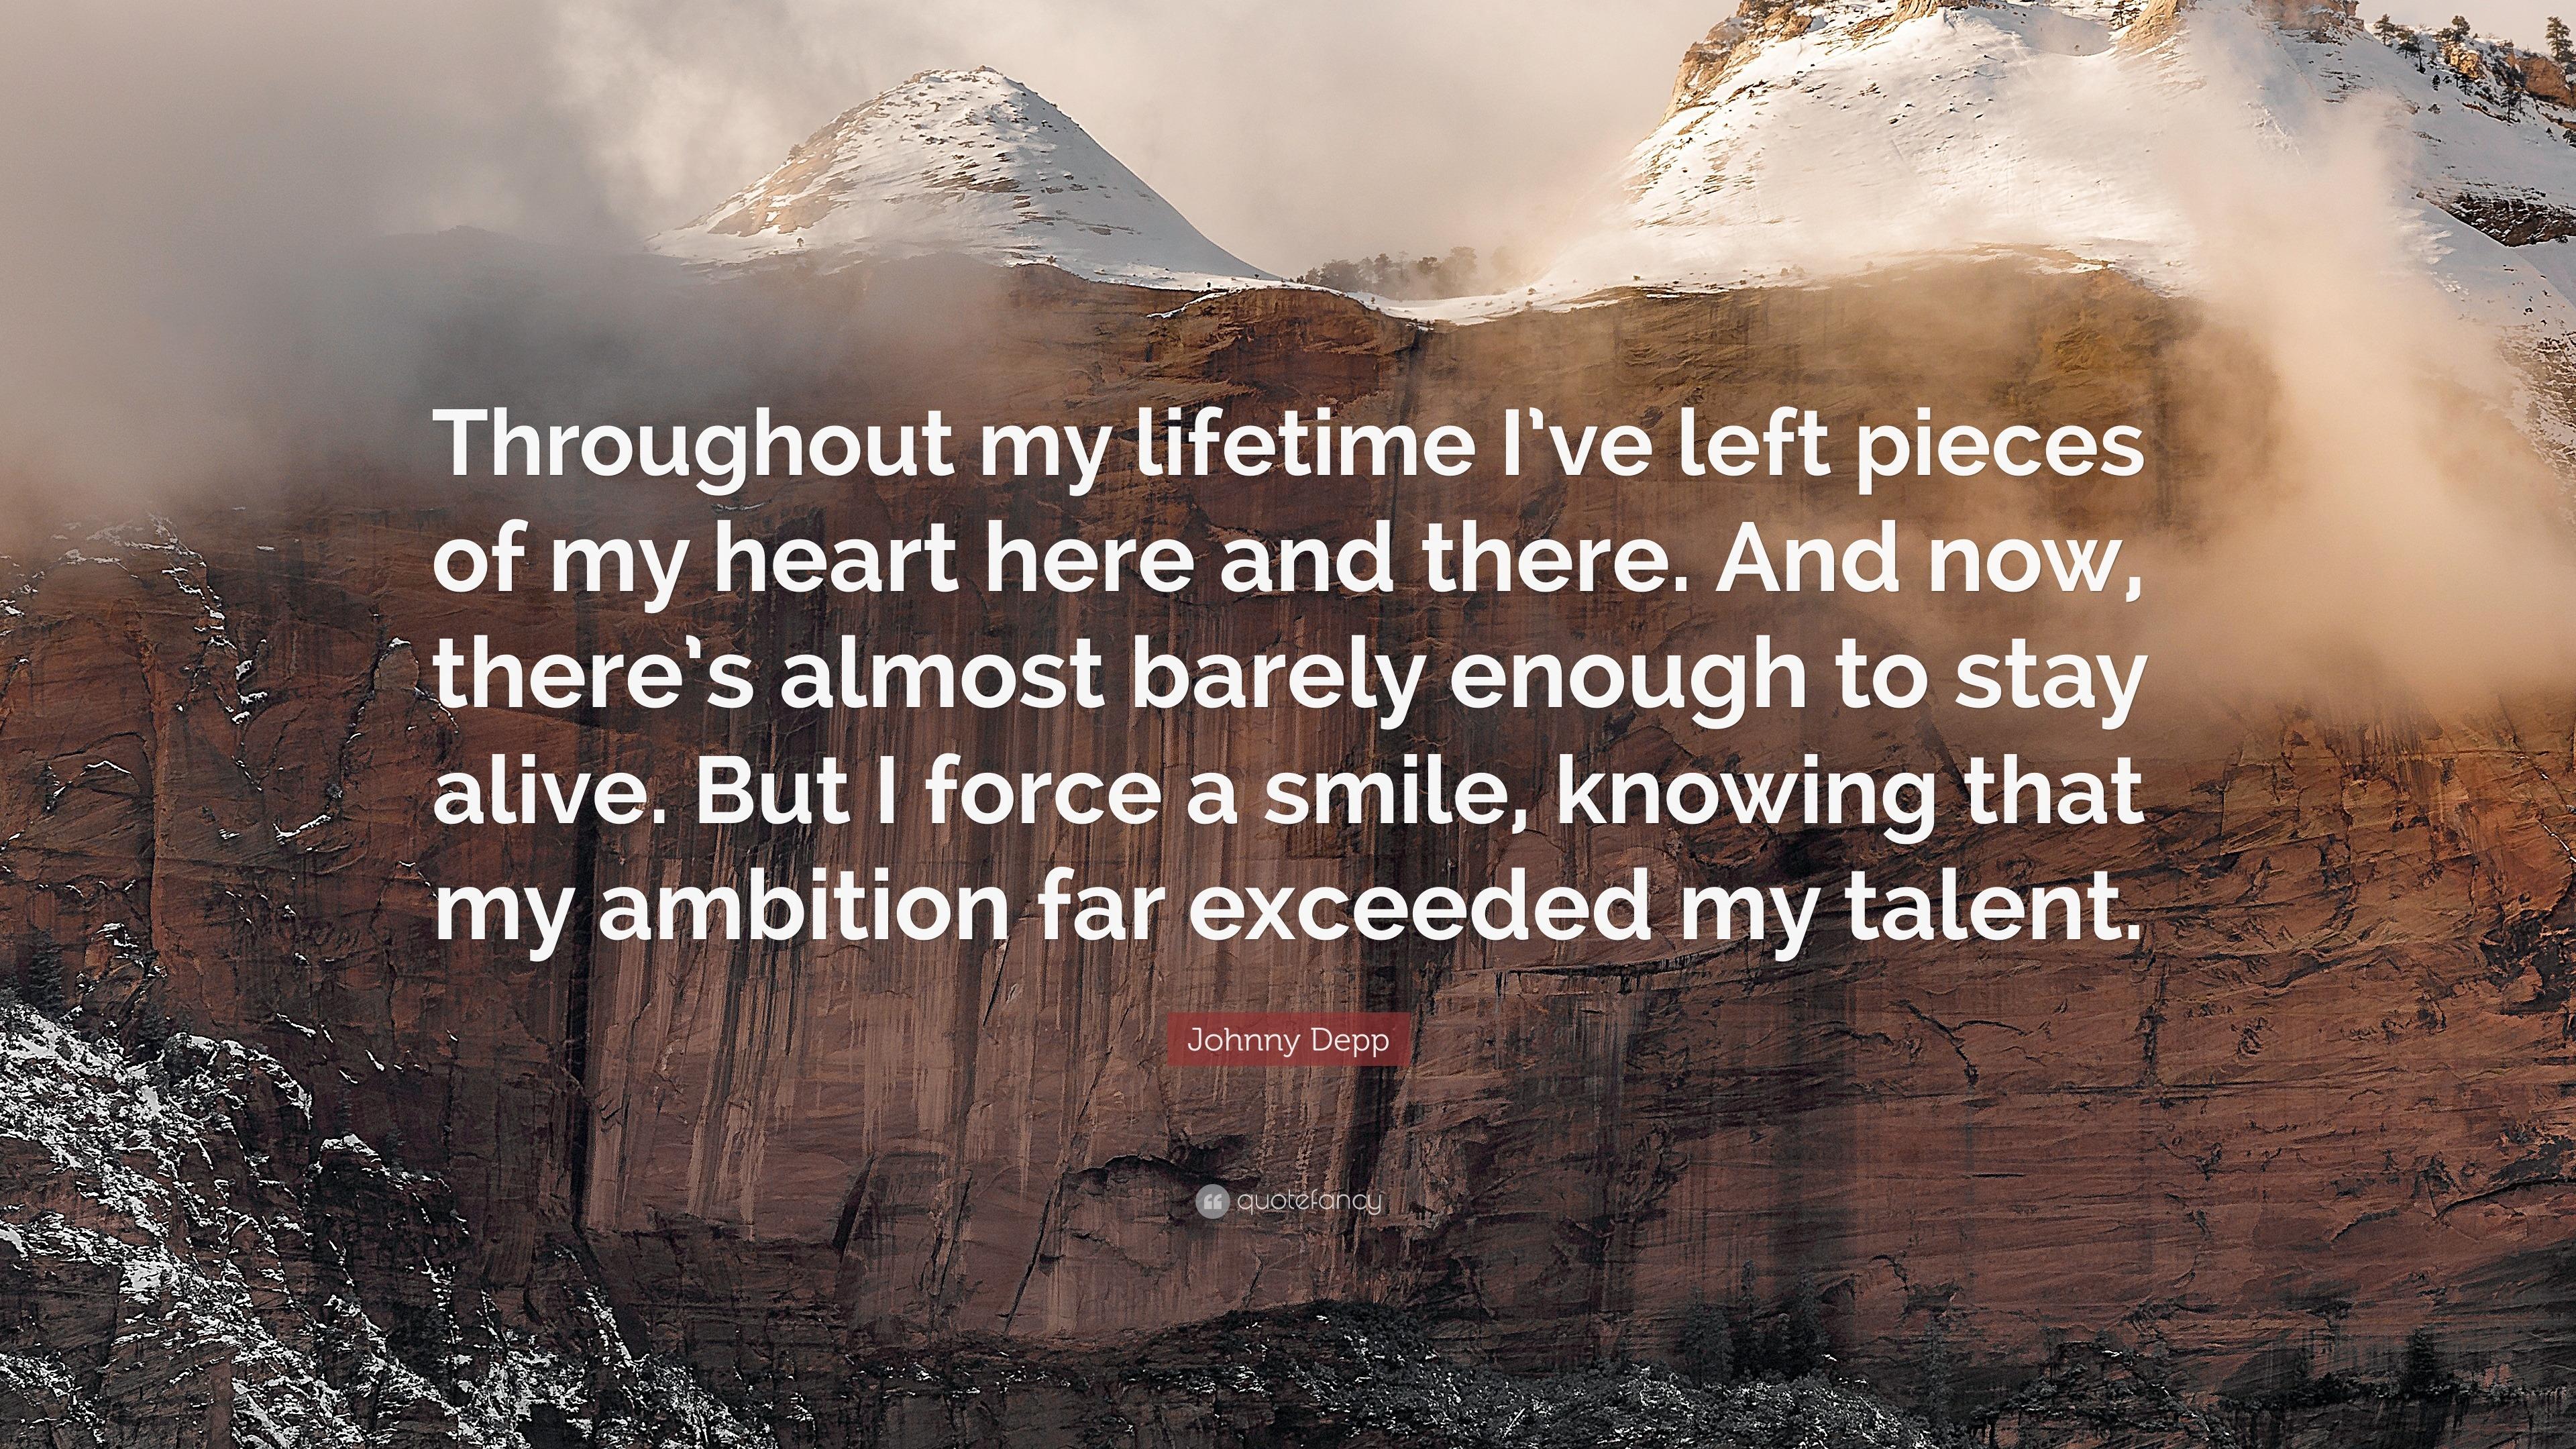 Broken Heart Quotes: U201cThroughout My Lifetime Iu0027ve Left Pieces Of My Heart